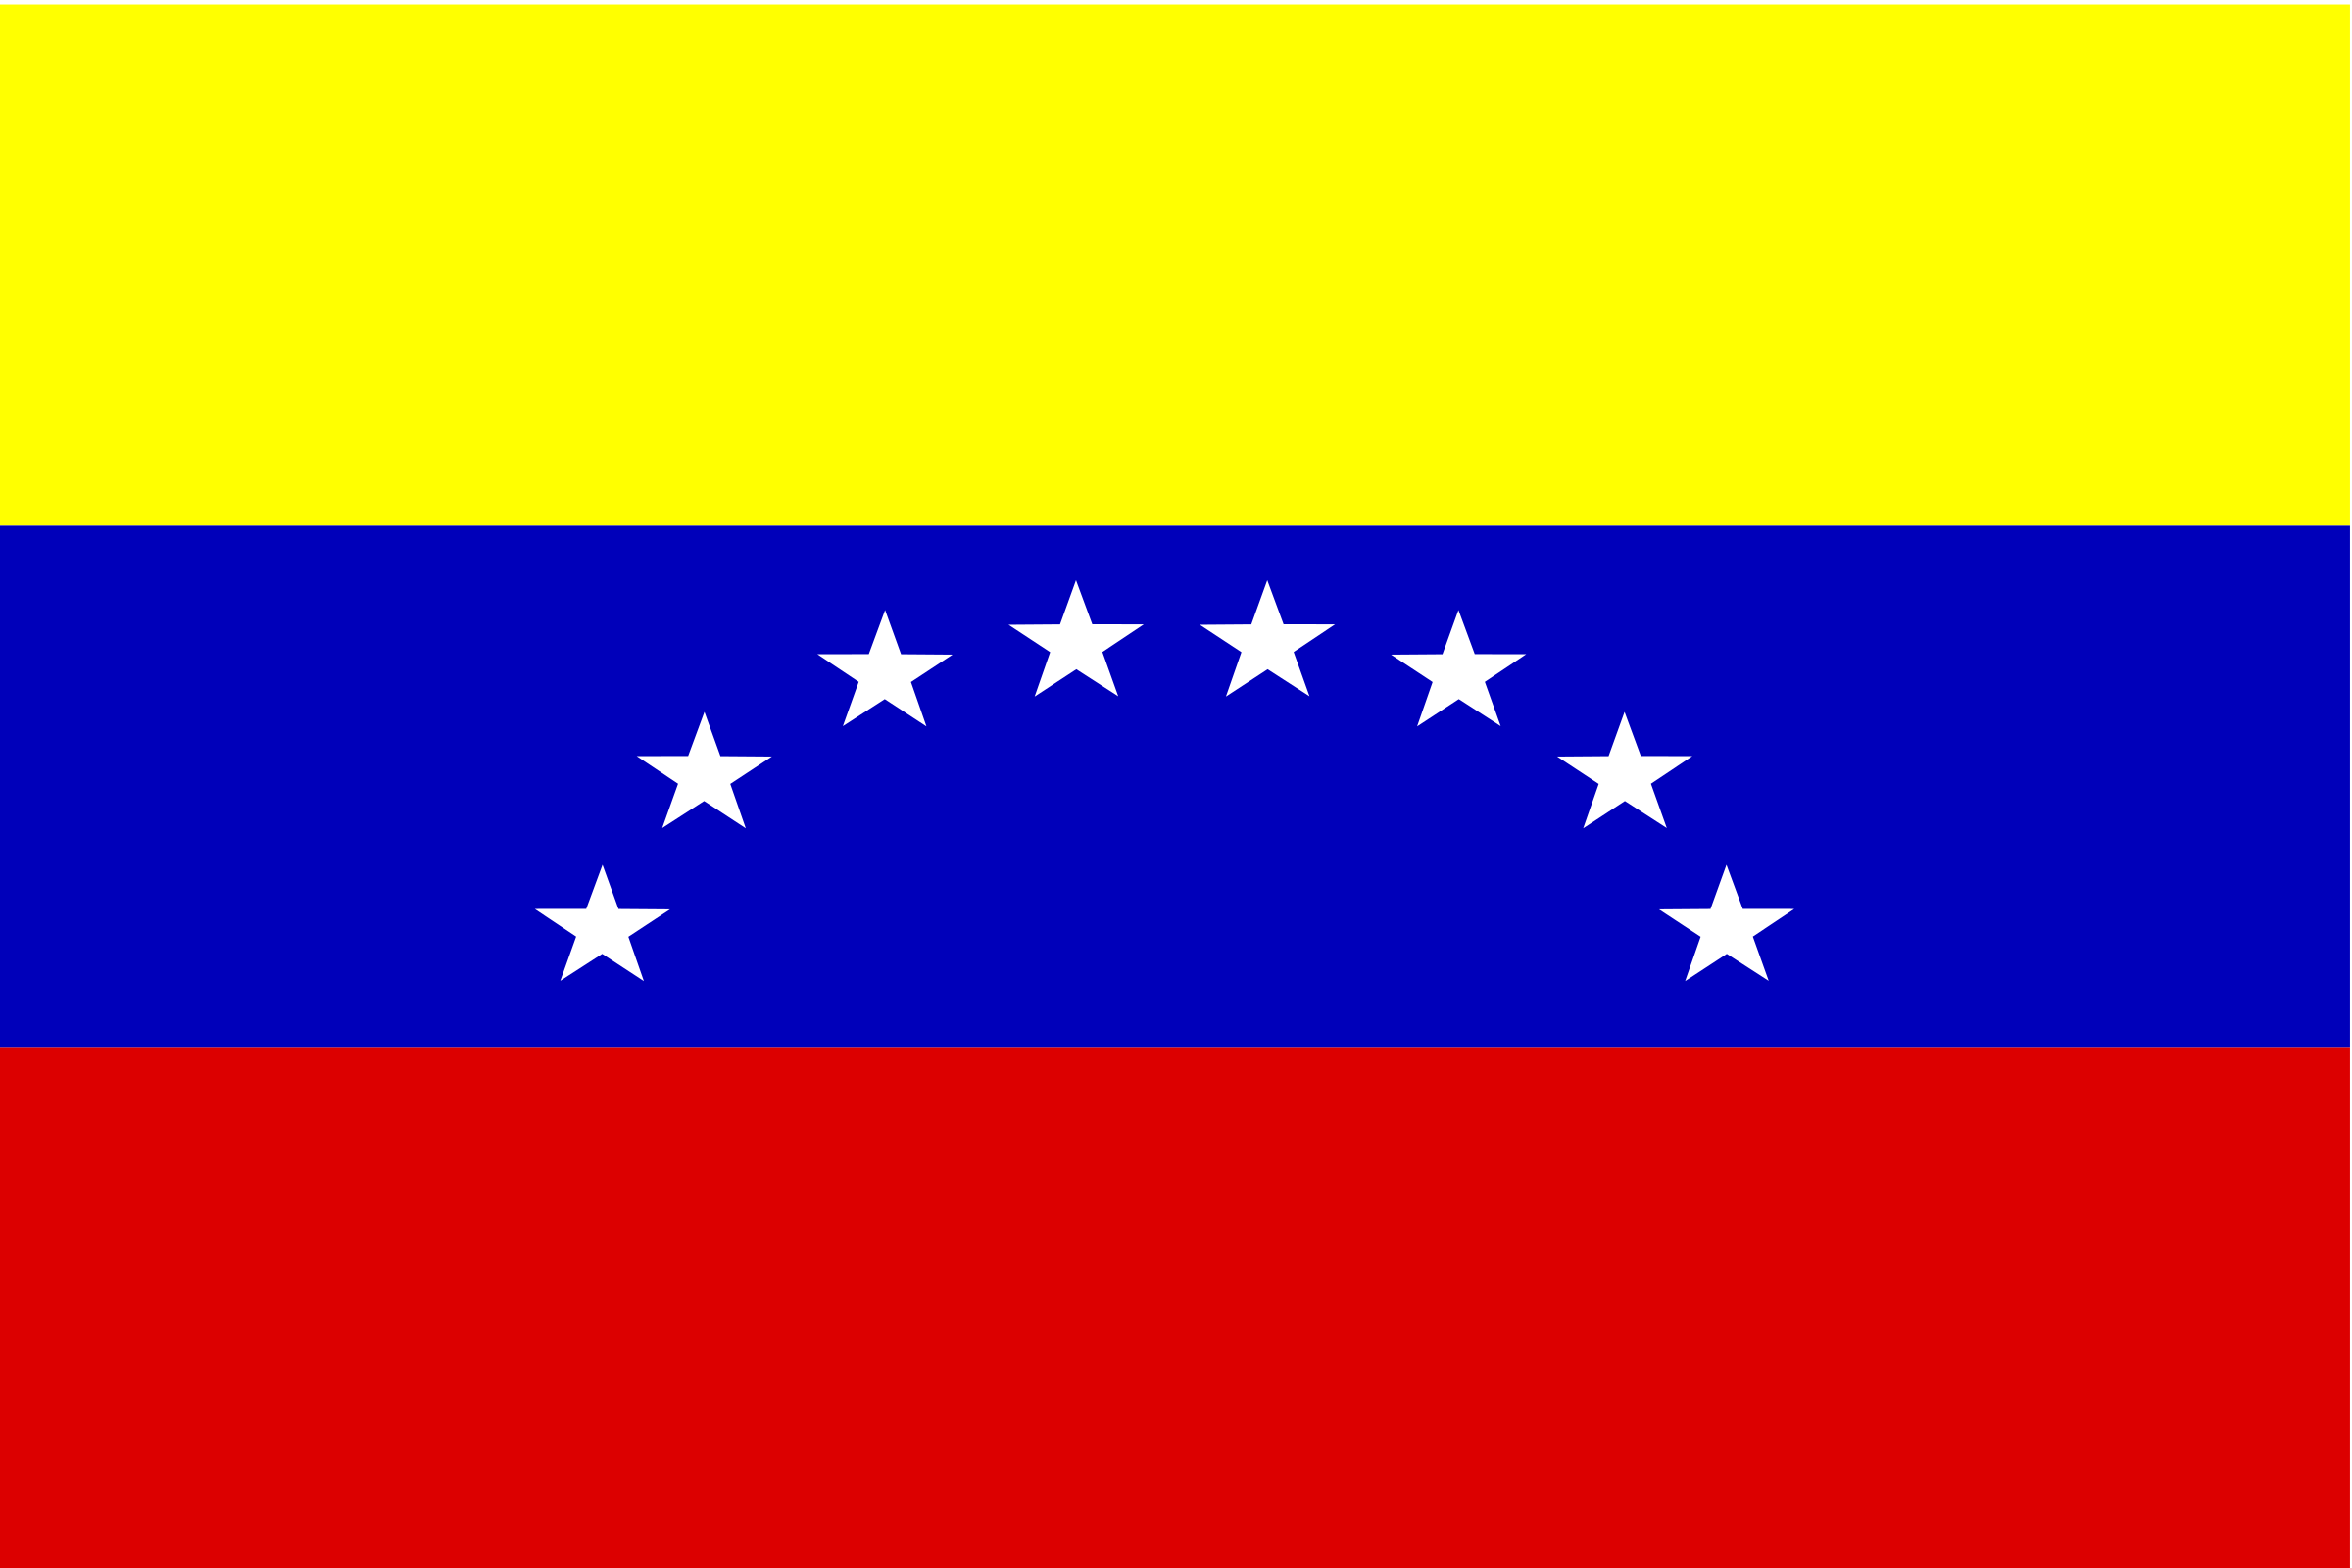 venezuela-8-stars-flag